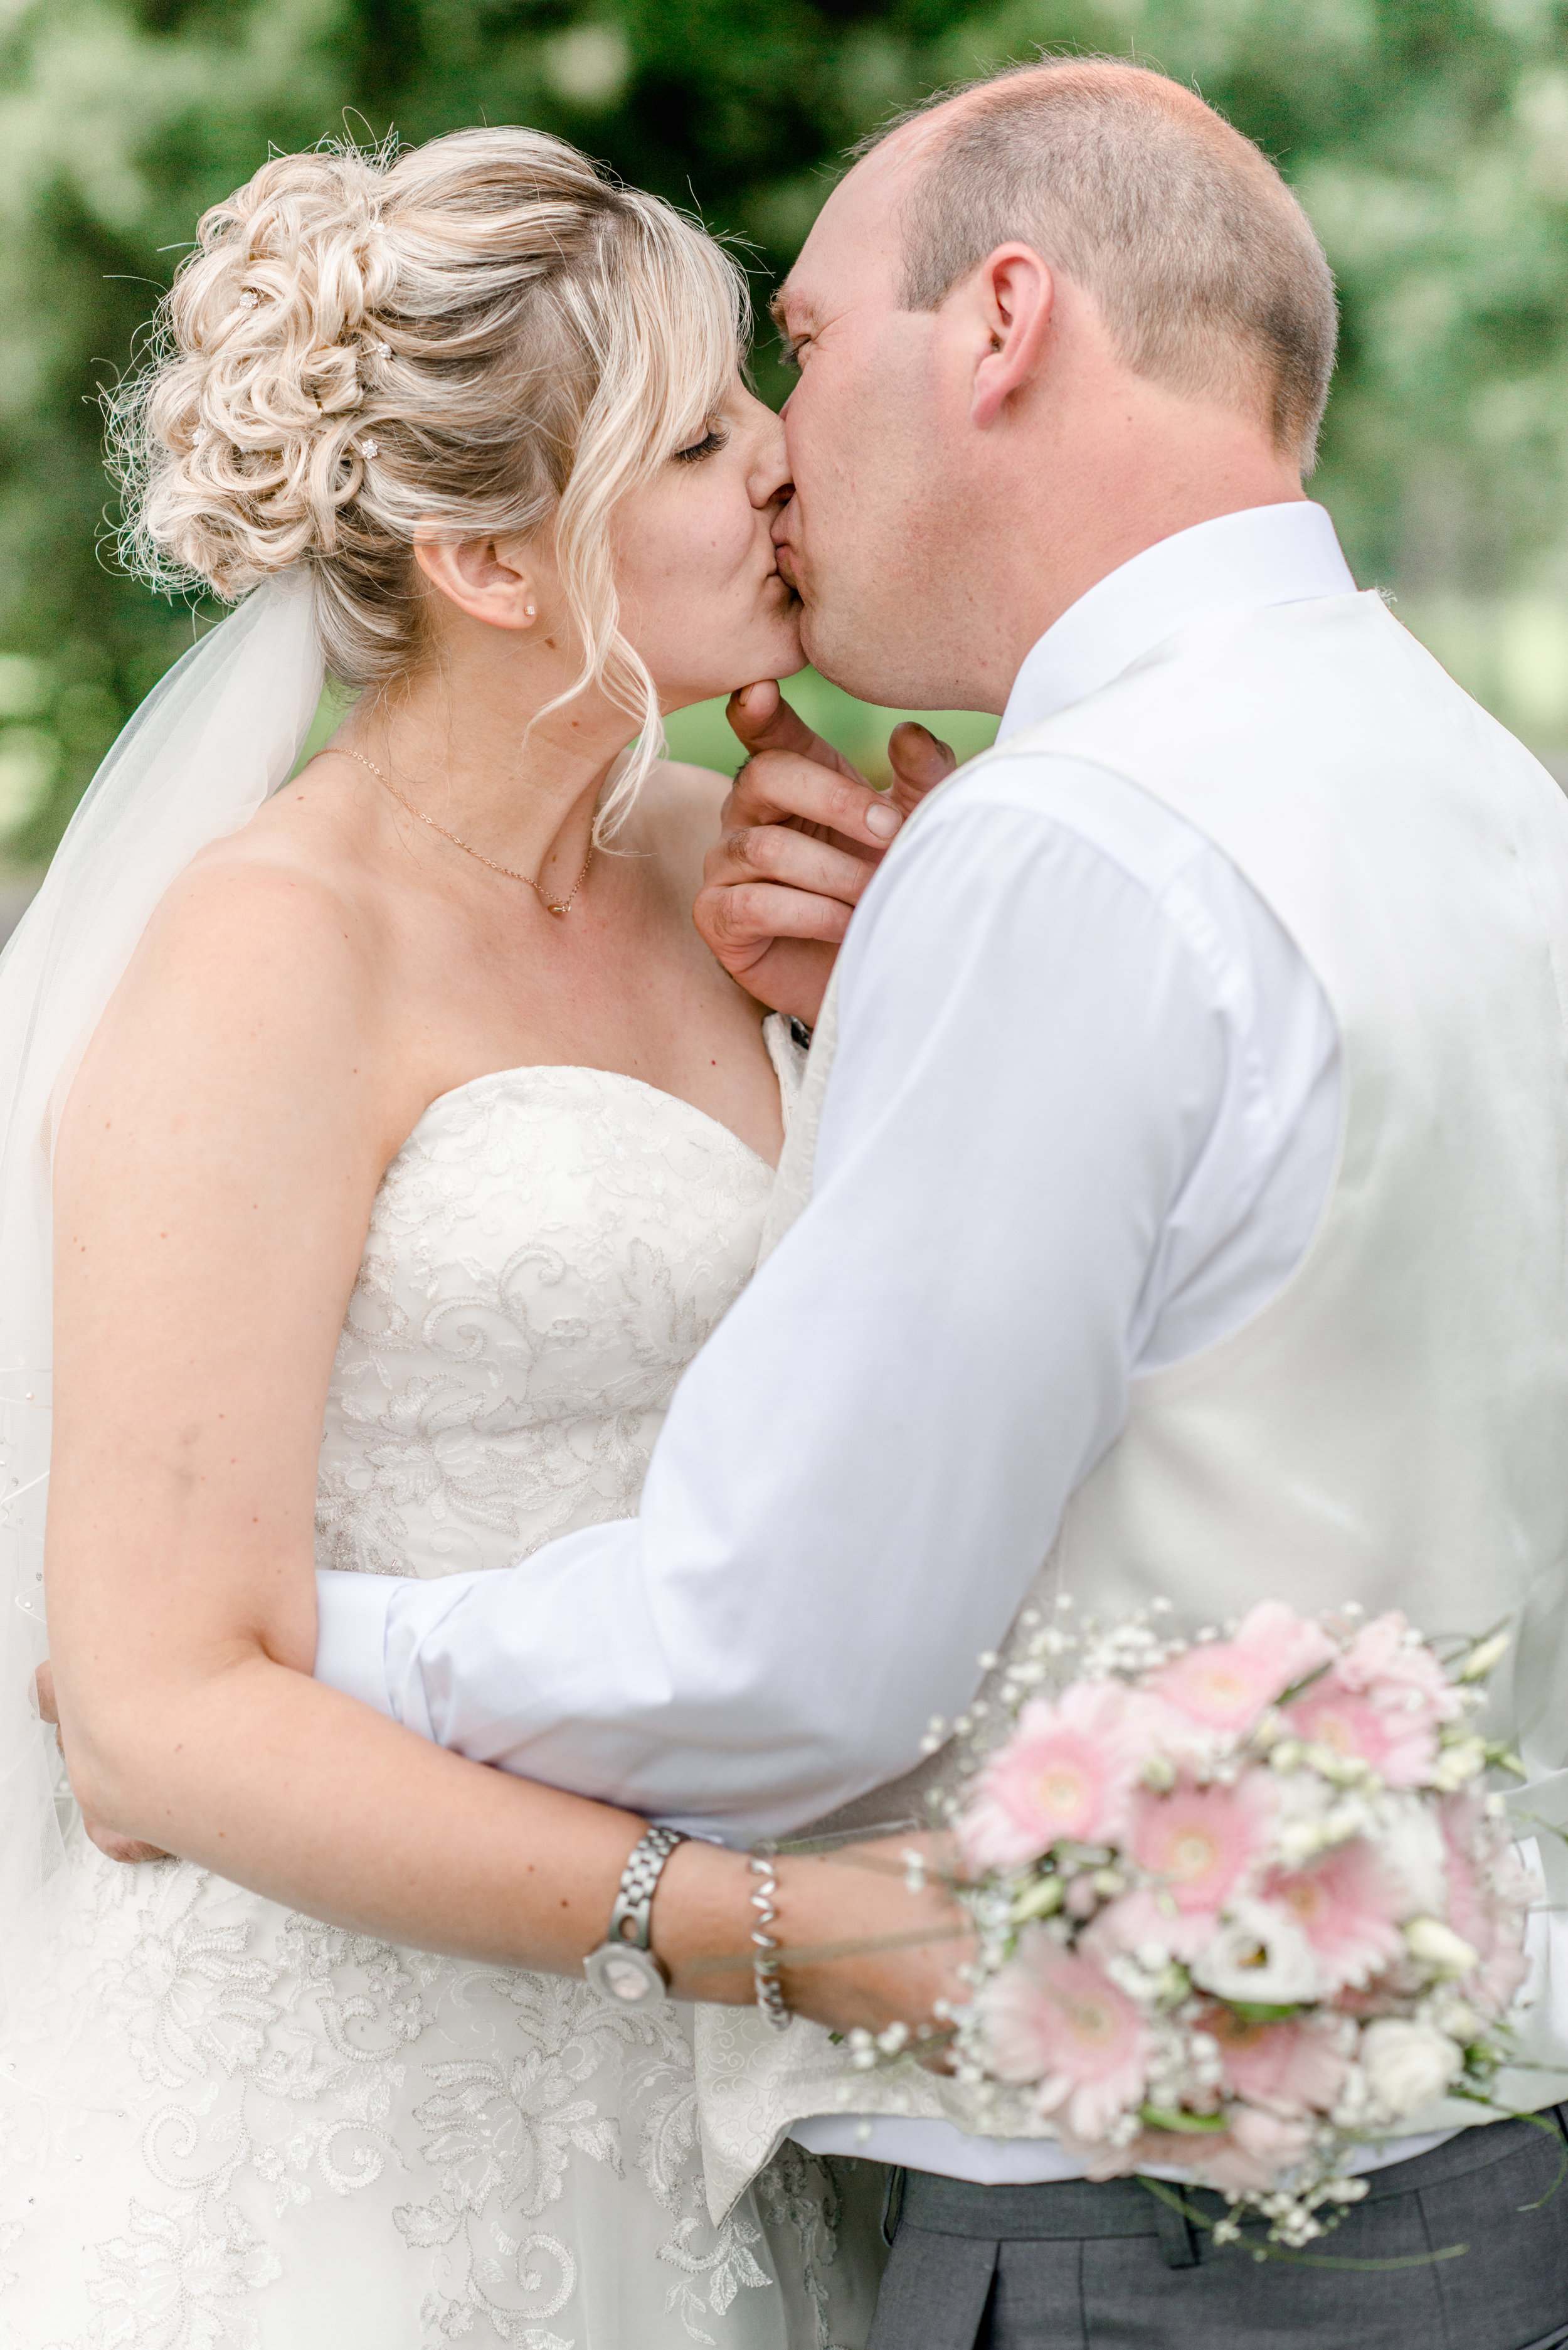 Bernadette and Stuart married at Belton Woods Golf Spa